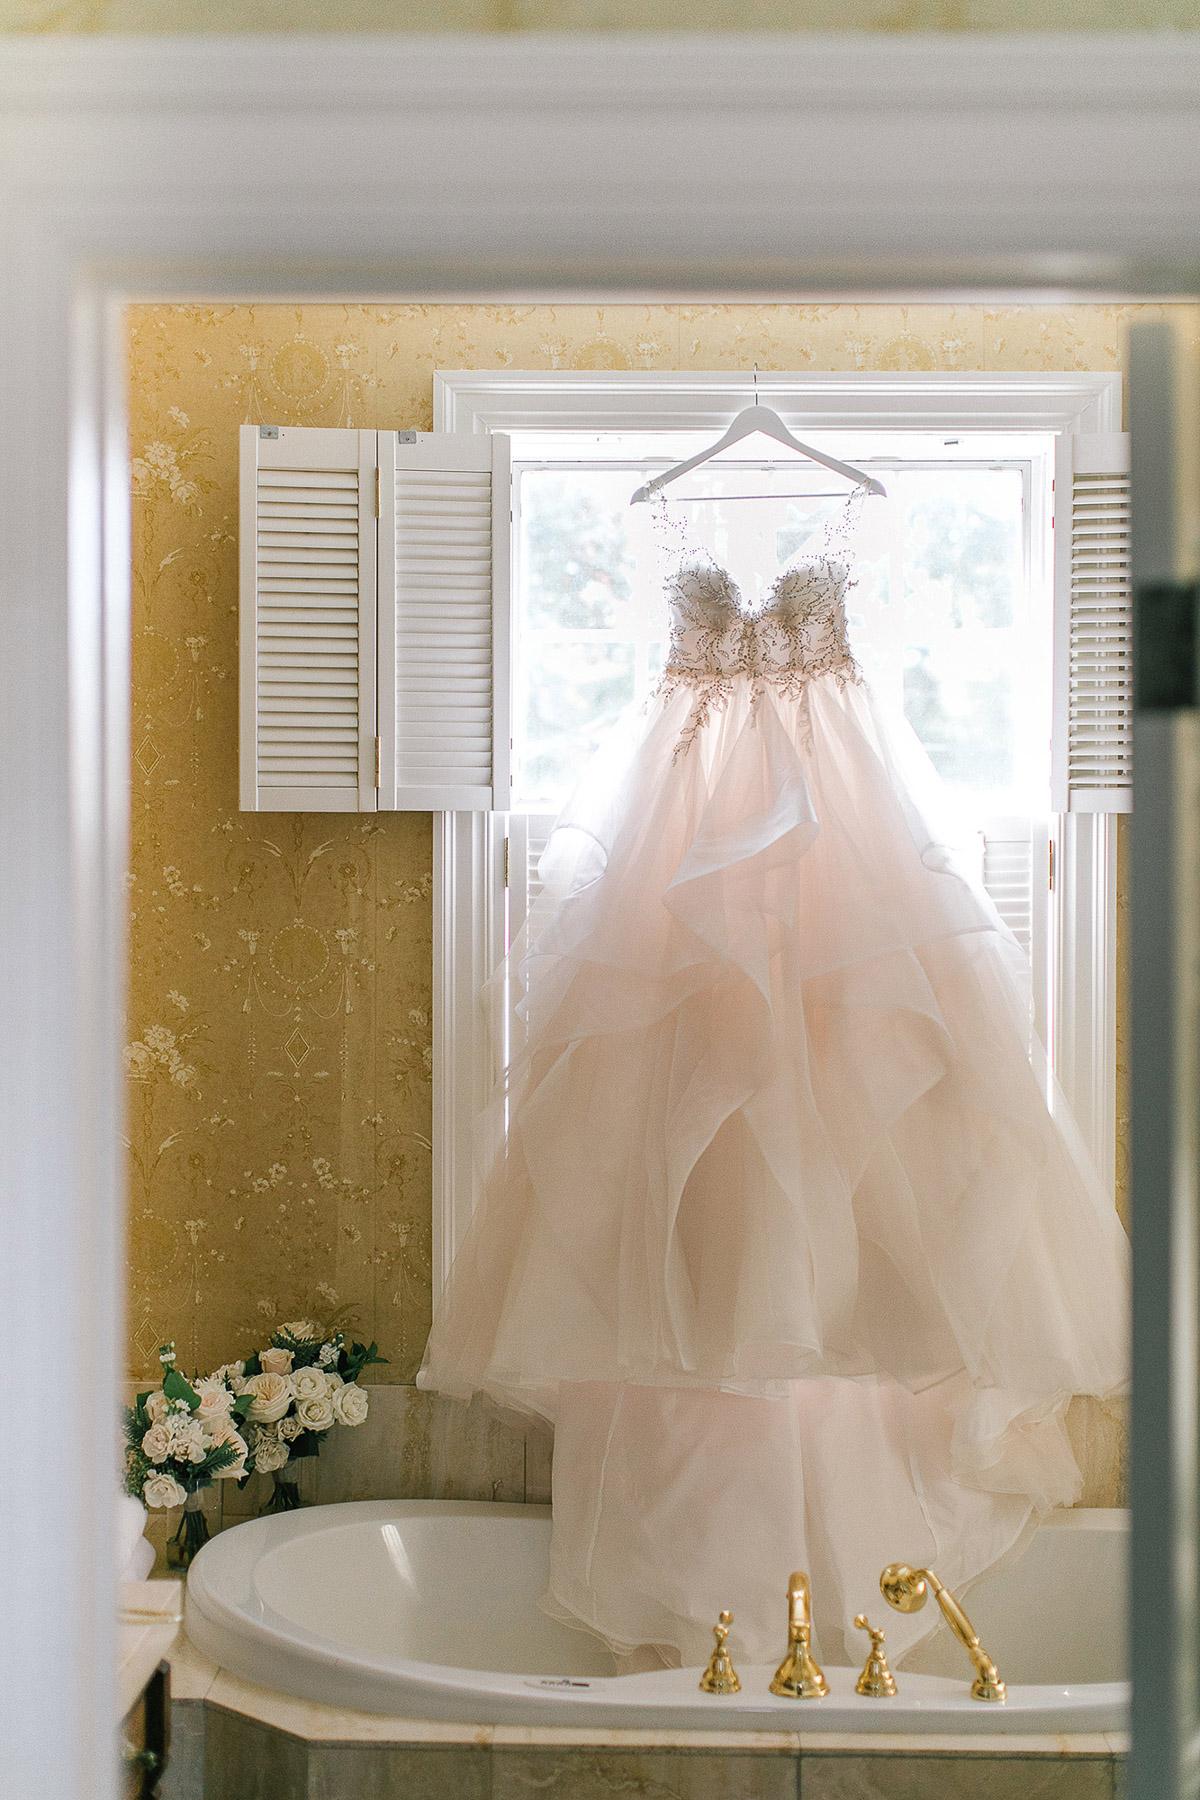 tamara-lockwood-photography-vineyard-bride-swish-list-the-old-courthouse-niagara-on-the-lake-wedding-2.jpg